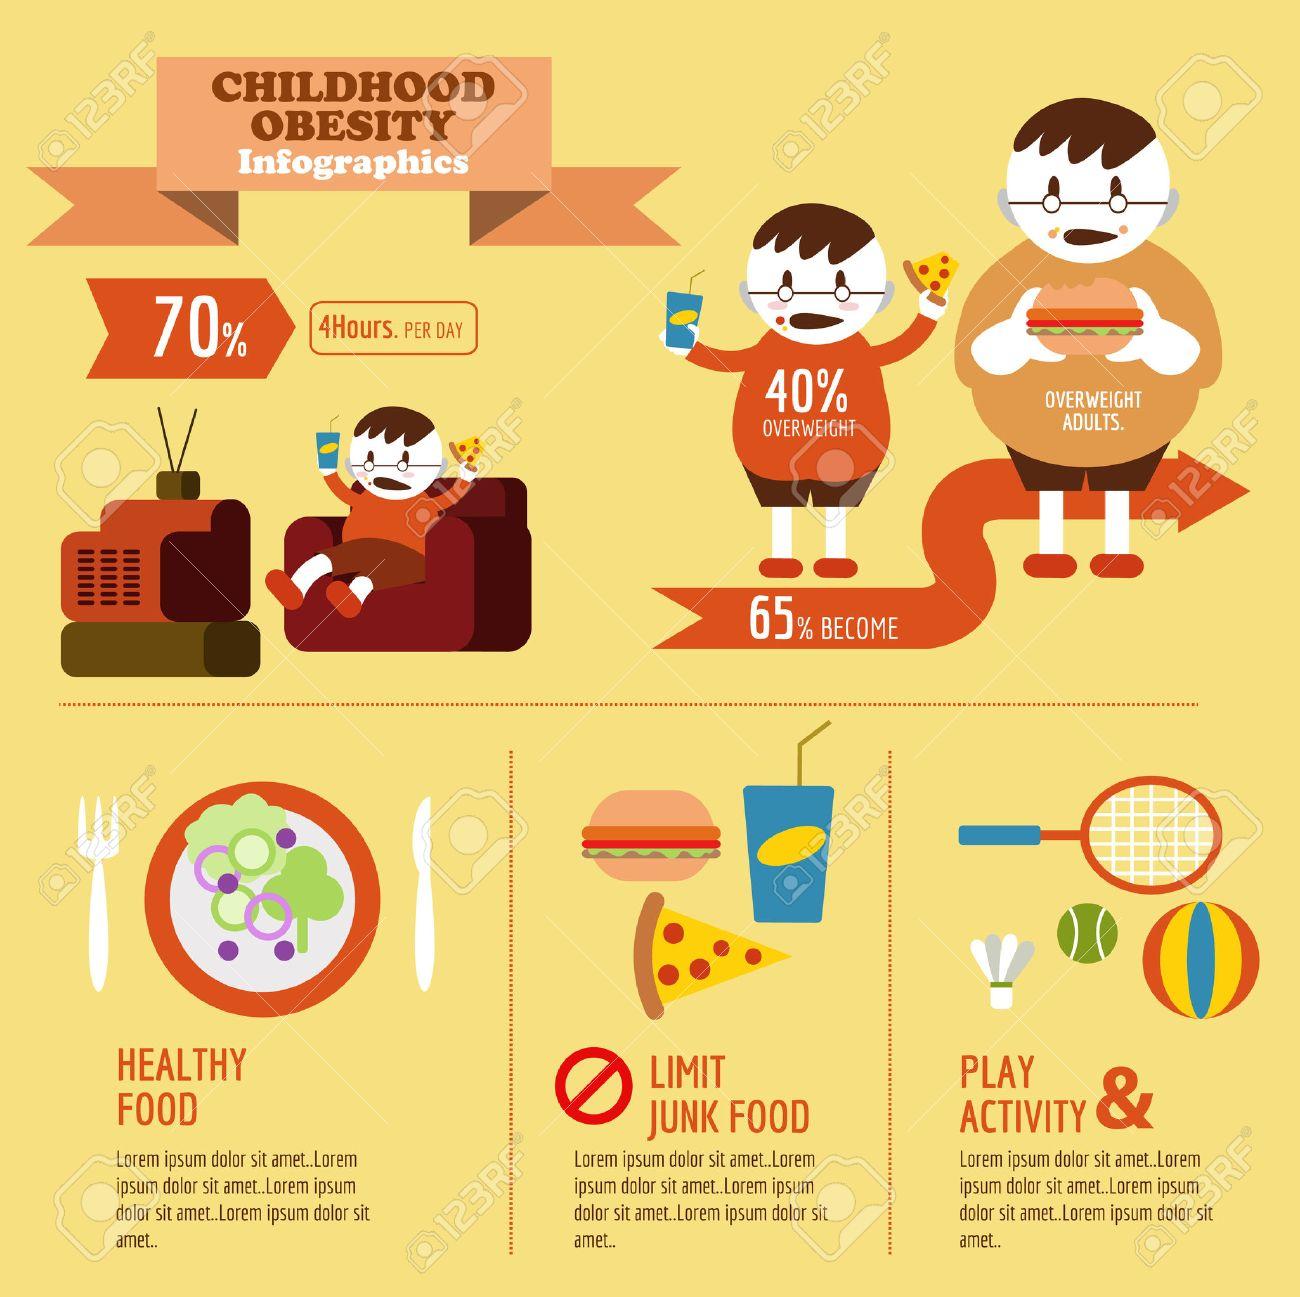 Childhood Obesity Info graphic. flat design element. vector illustration - 32490229